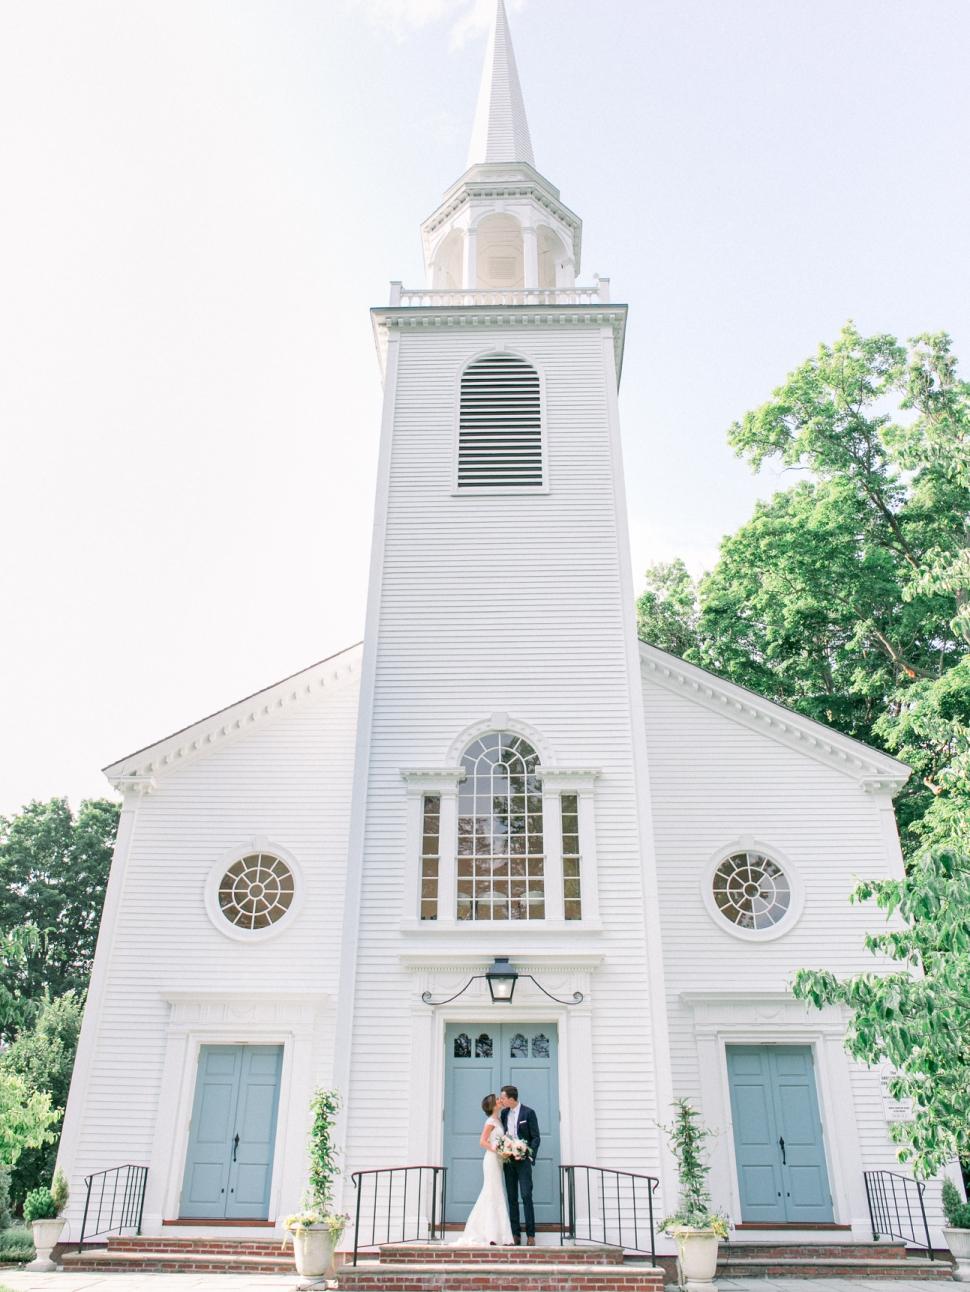 Connecticut-Wedding-Photographer-Cassi-Claire-Shorehaven-Golf-Club-Wedding_30.jpg